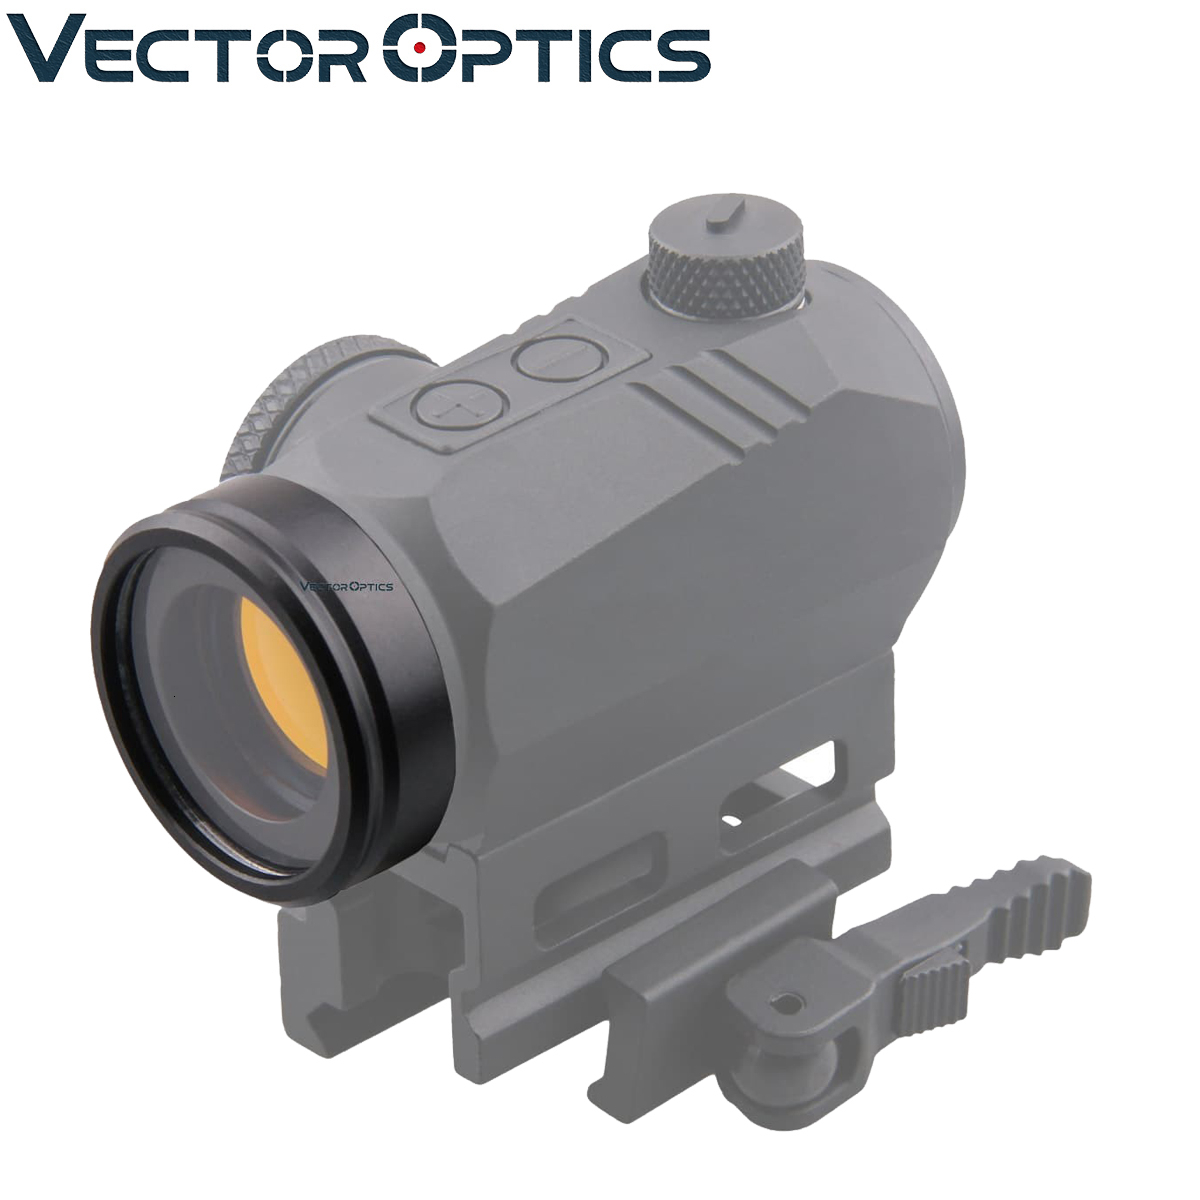 Vector Optics Red Dot Sight Scope Lens Protection Cover Fit Harpy Maverick Centurion Full Metal For Airsoft Game Avoid Broken